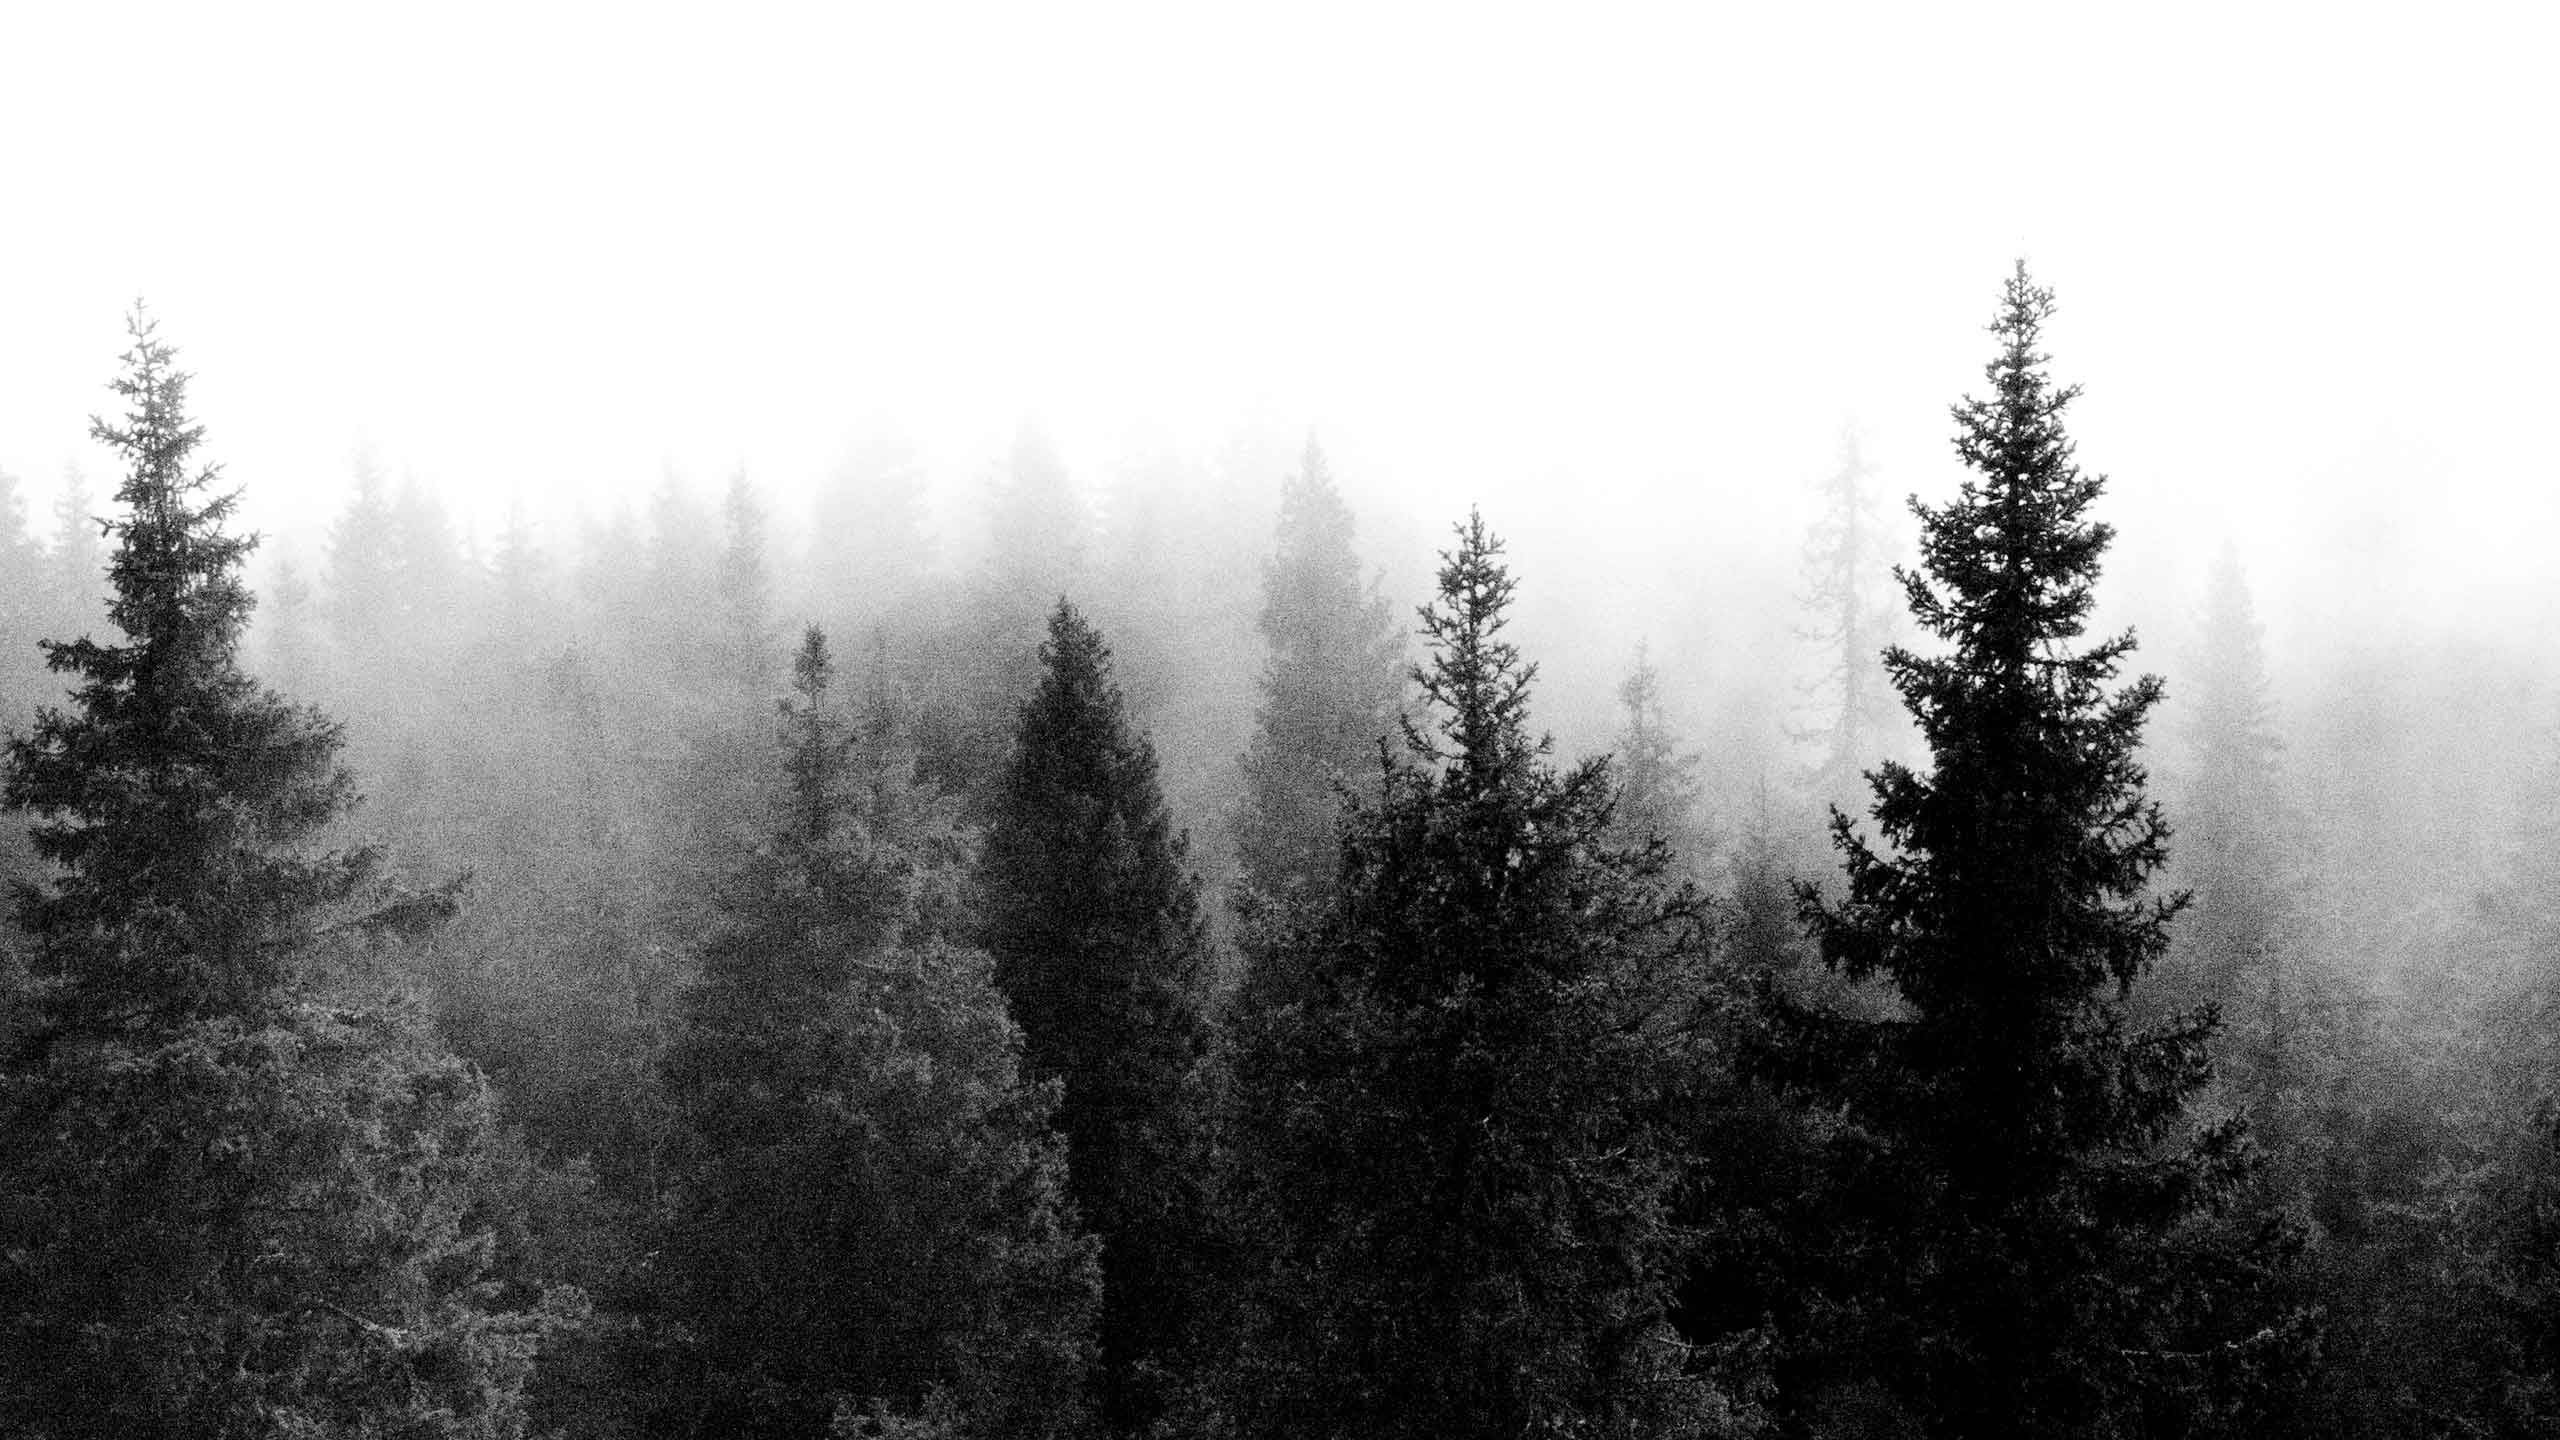 Картинка белый лес на черном фоне